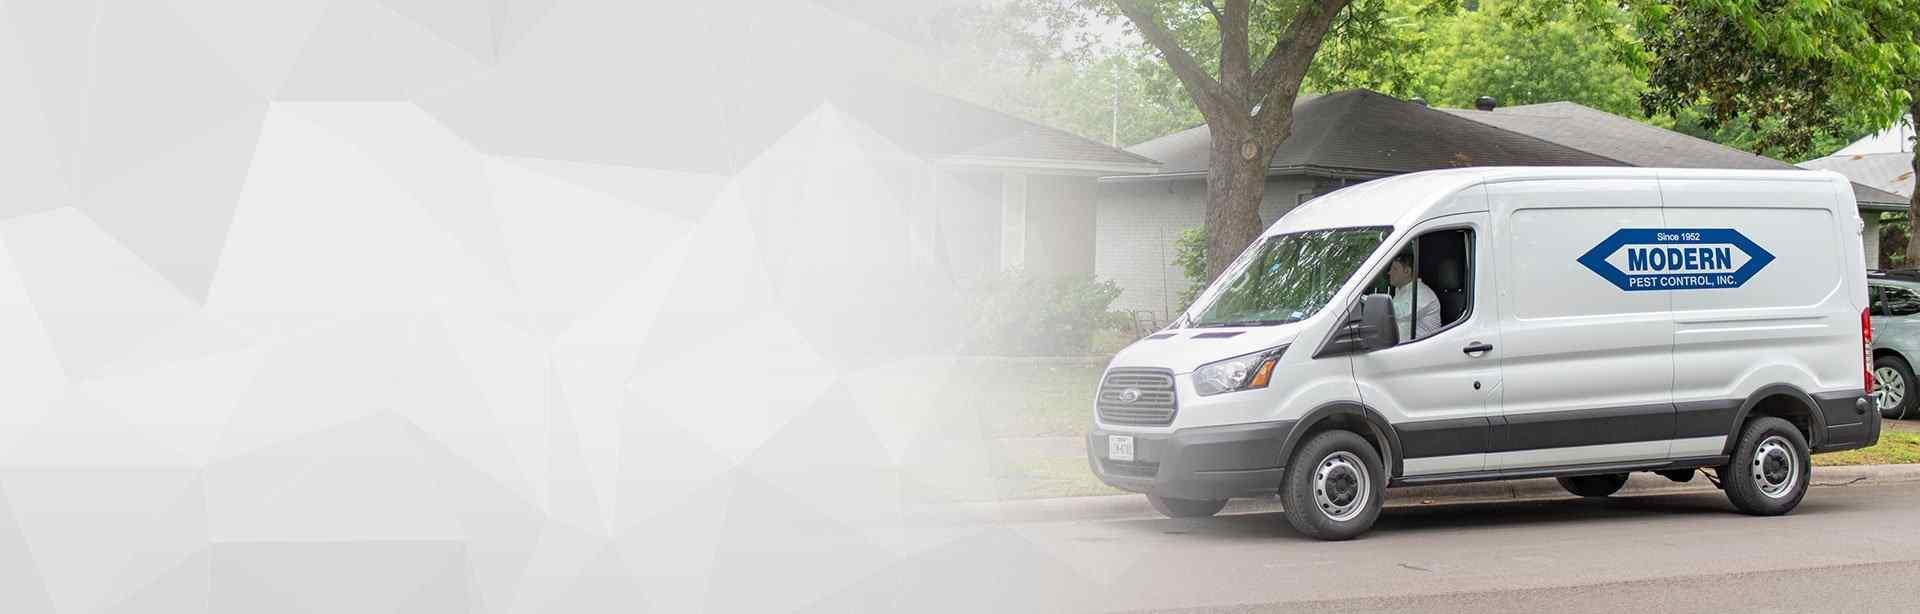 modern pest control van in front of texas home